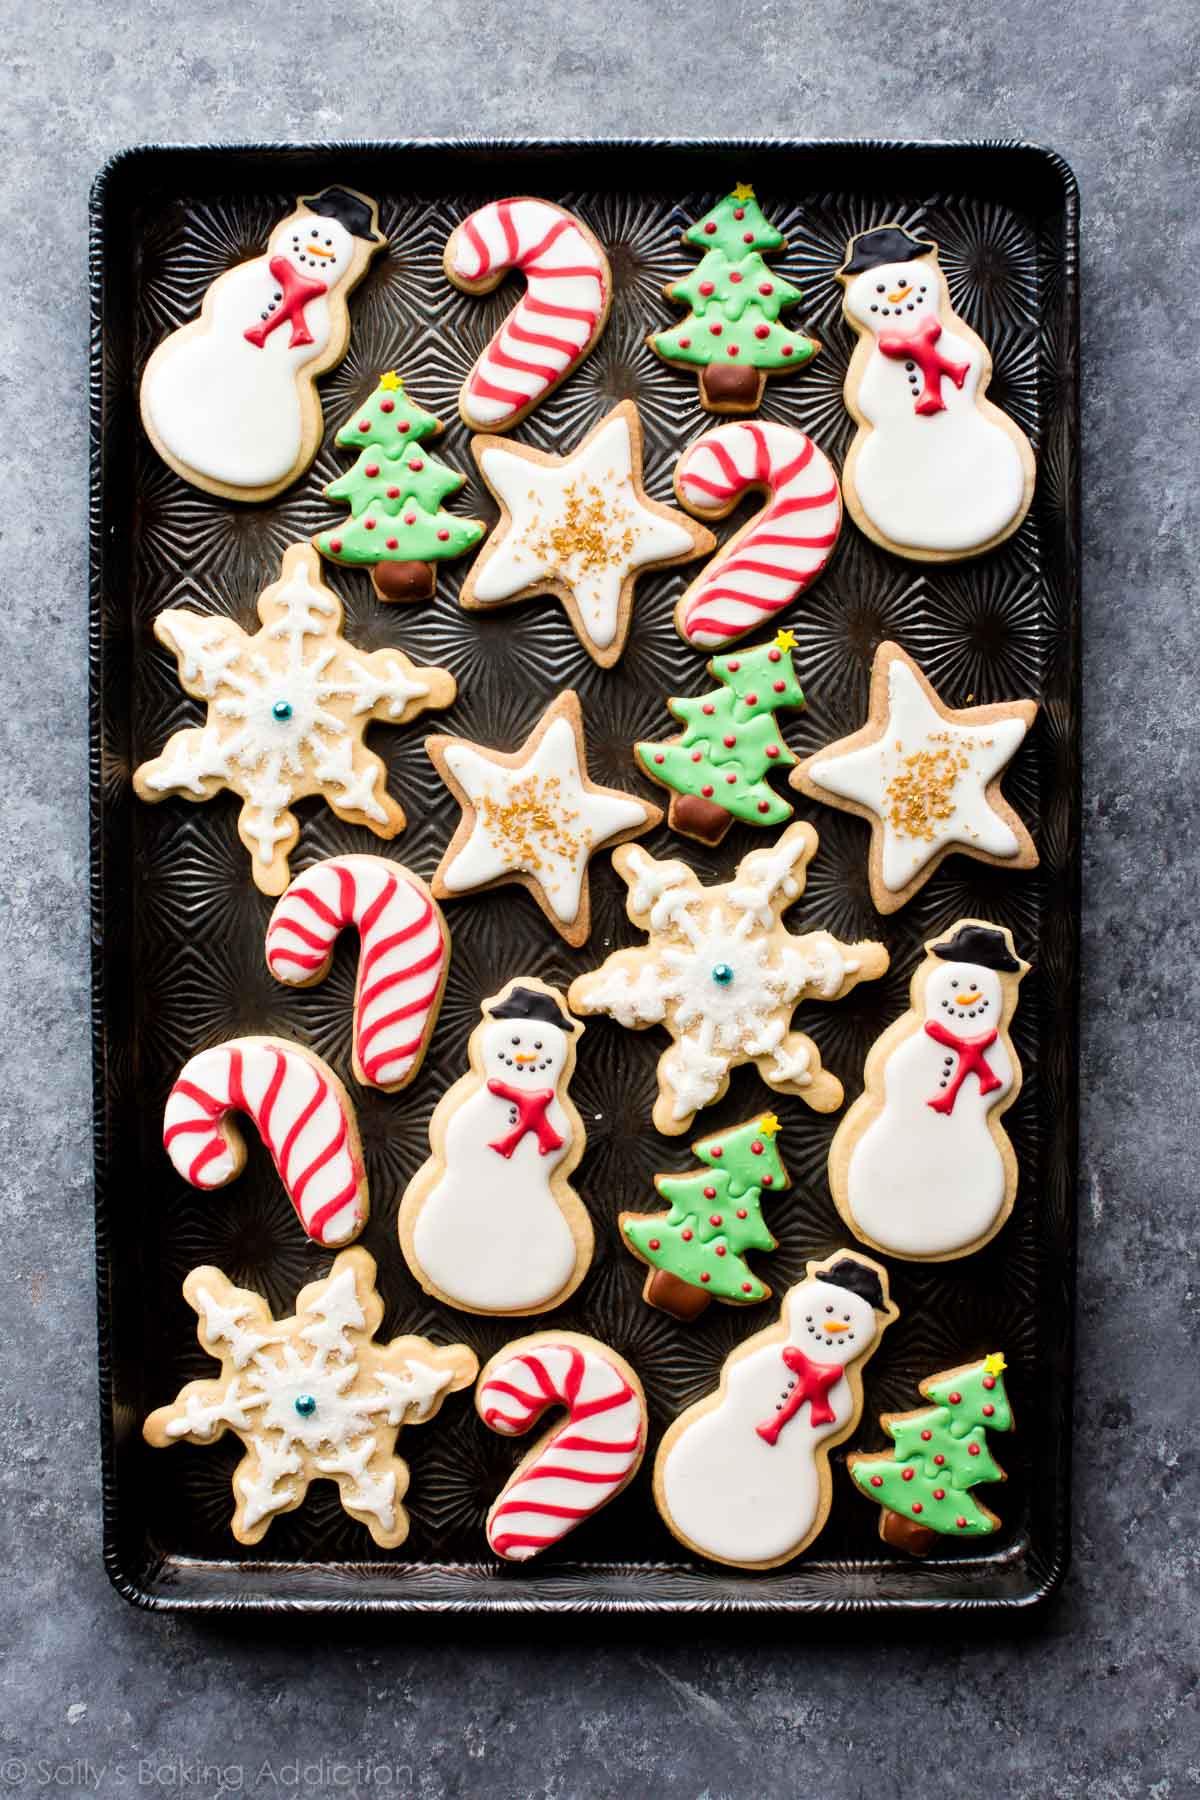 Sugar Cookies Christmas  1 Sugar Cookie Dough 5 Ways to Decorate Sallys Baking